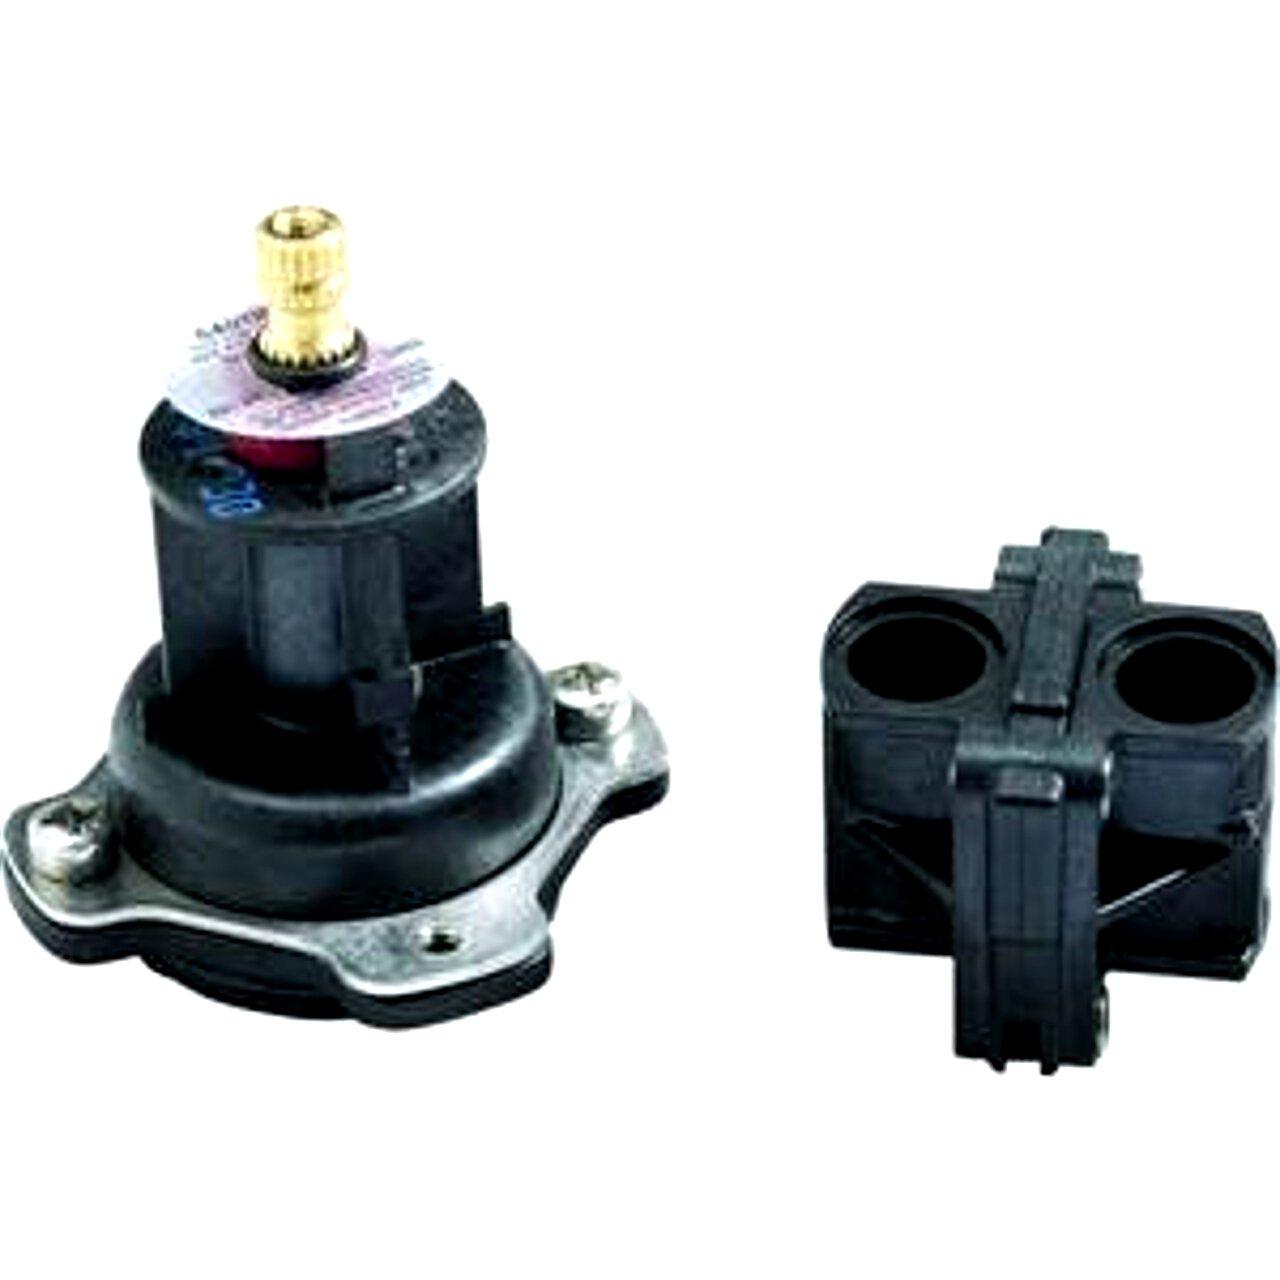 Kohler Repair Kit For Single Handle Pressure Balance Valve